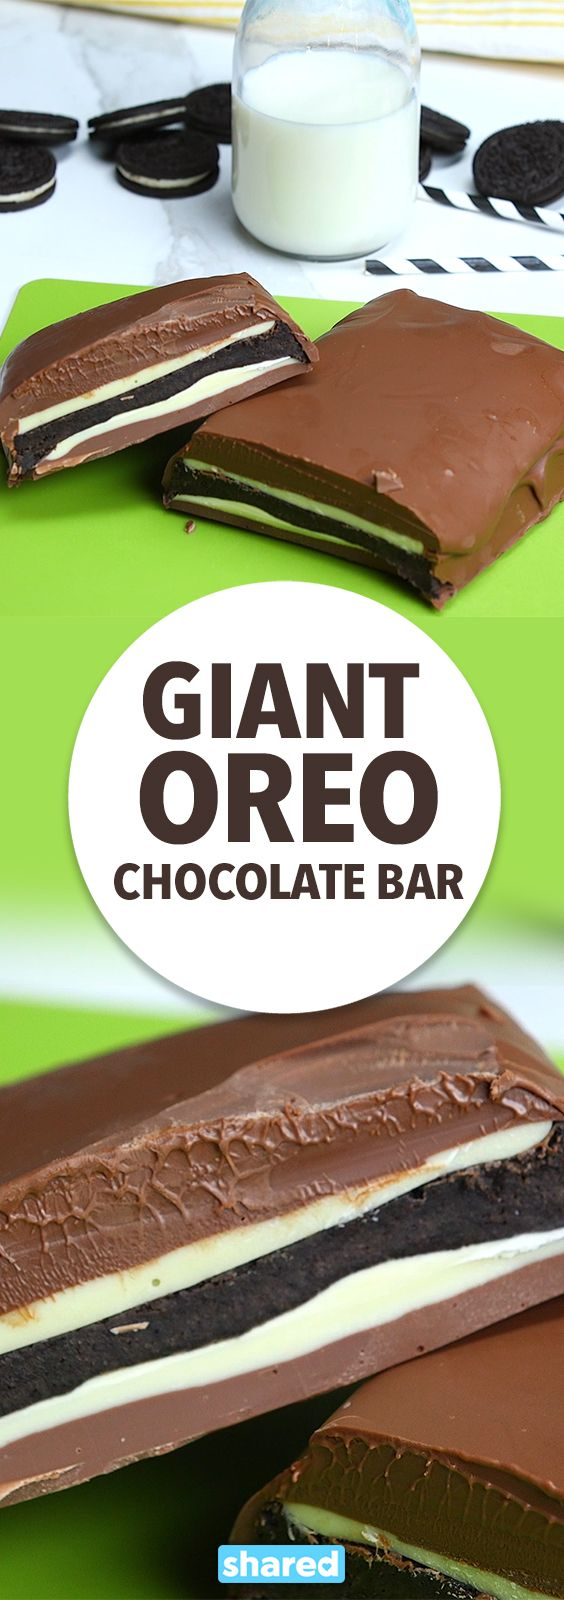 Giant Oreo Chocolate Bar